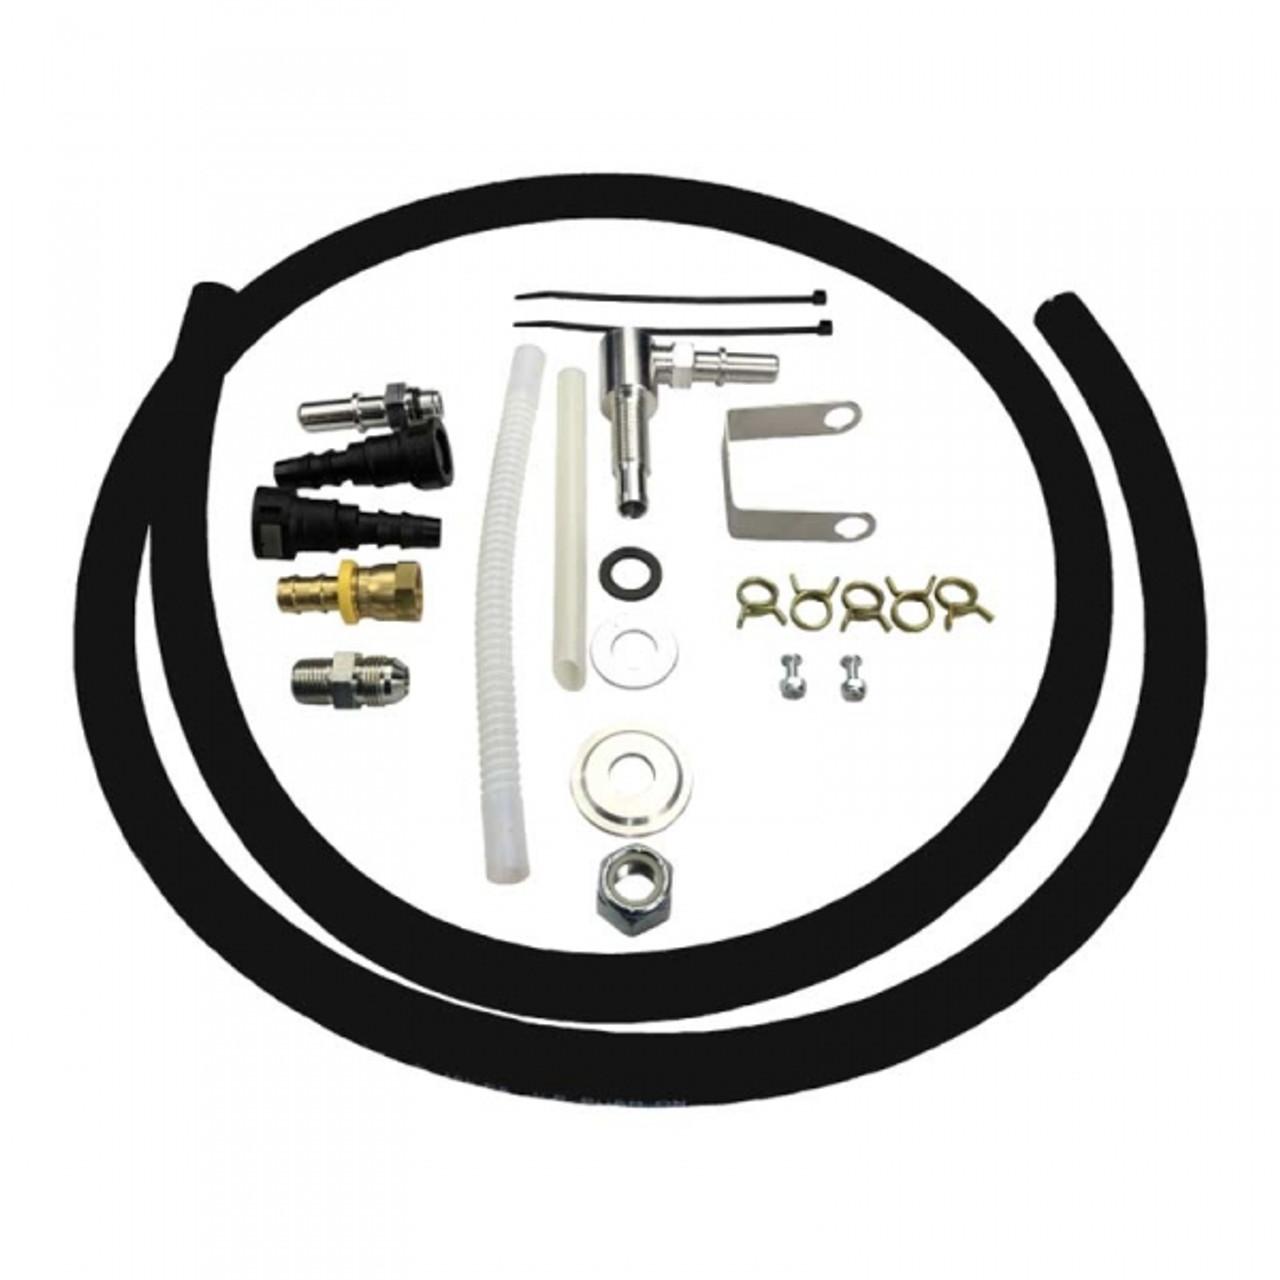 AirDog 901-04-0003-3 Indicator Low Pressure Light Kit Interior ...